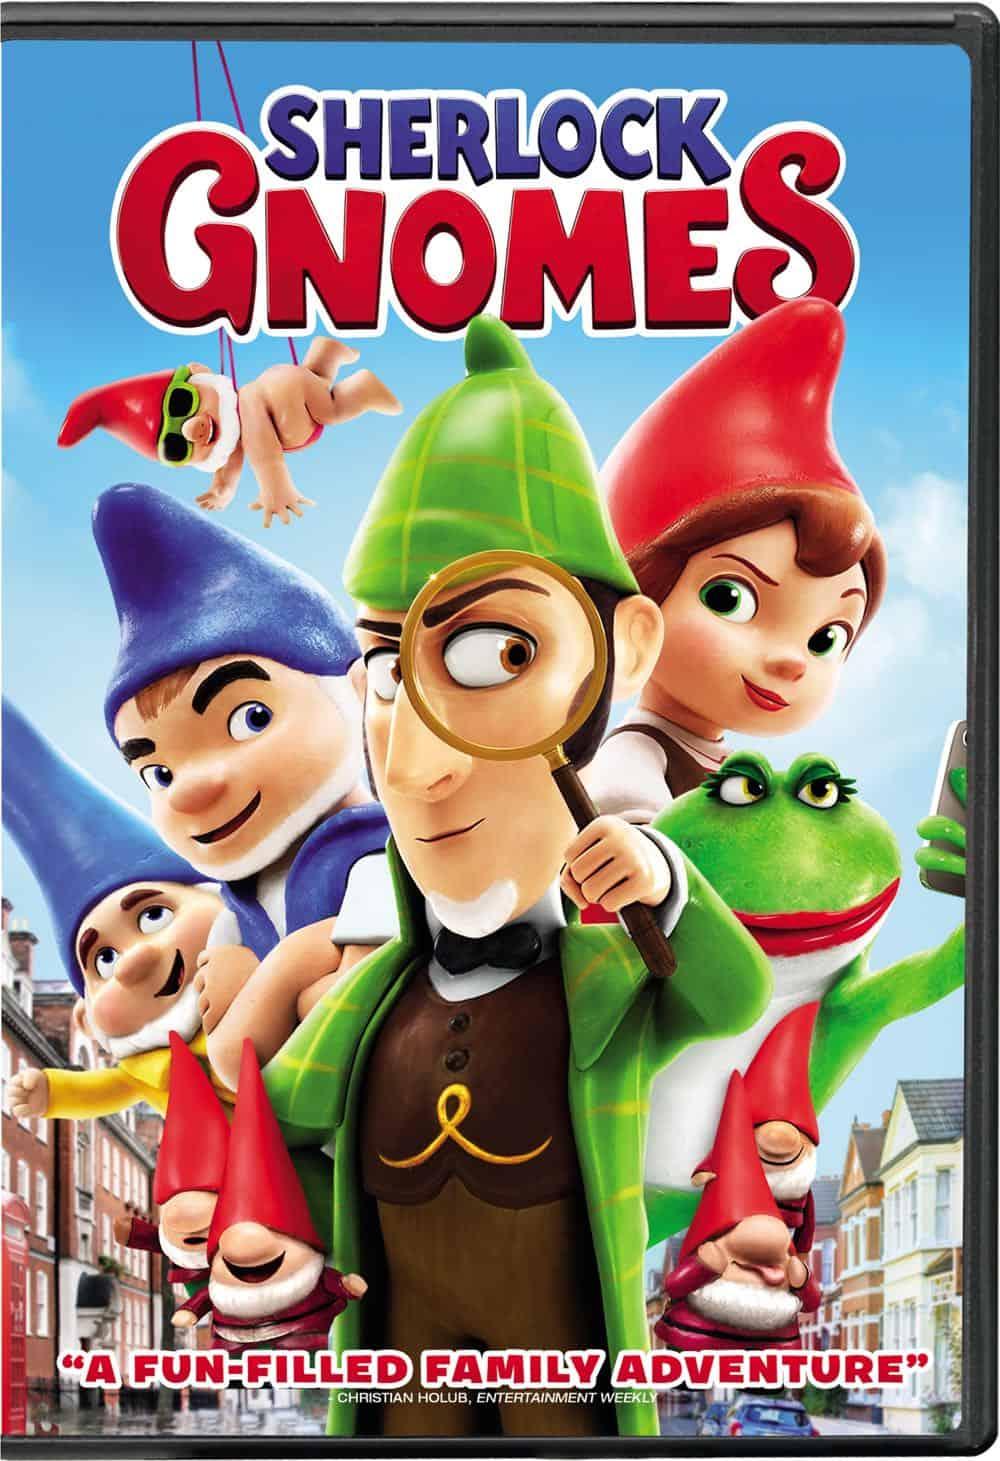 SherlockGnomes_DVD_Front_wCase